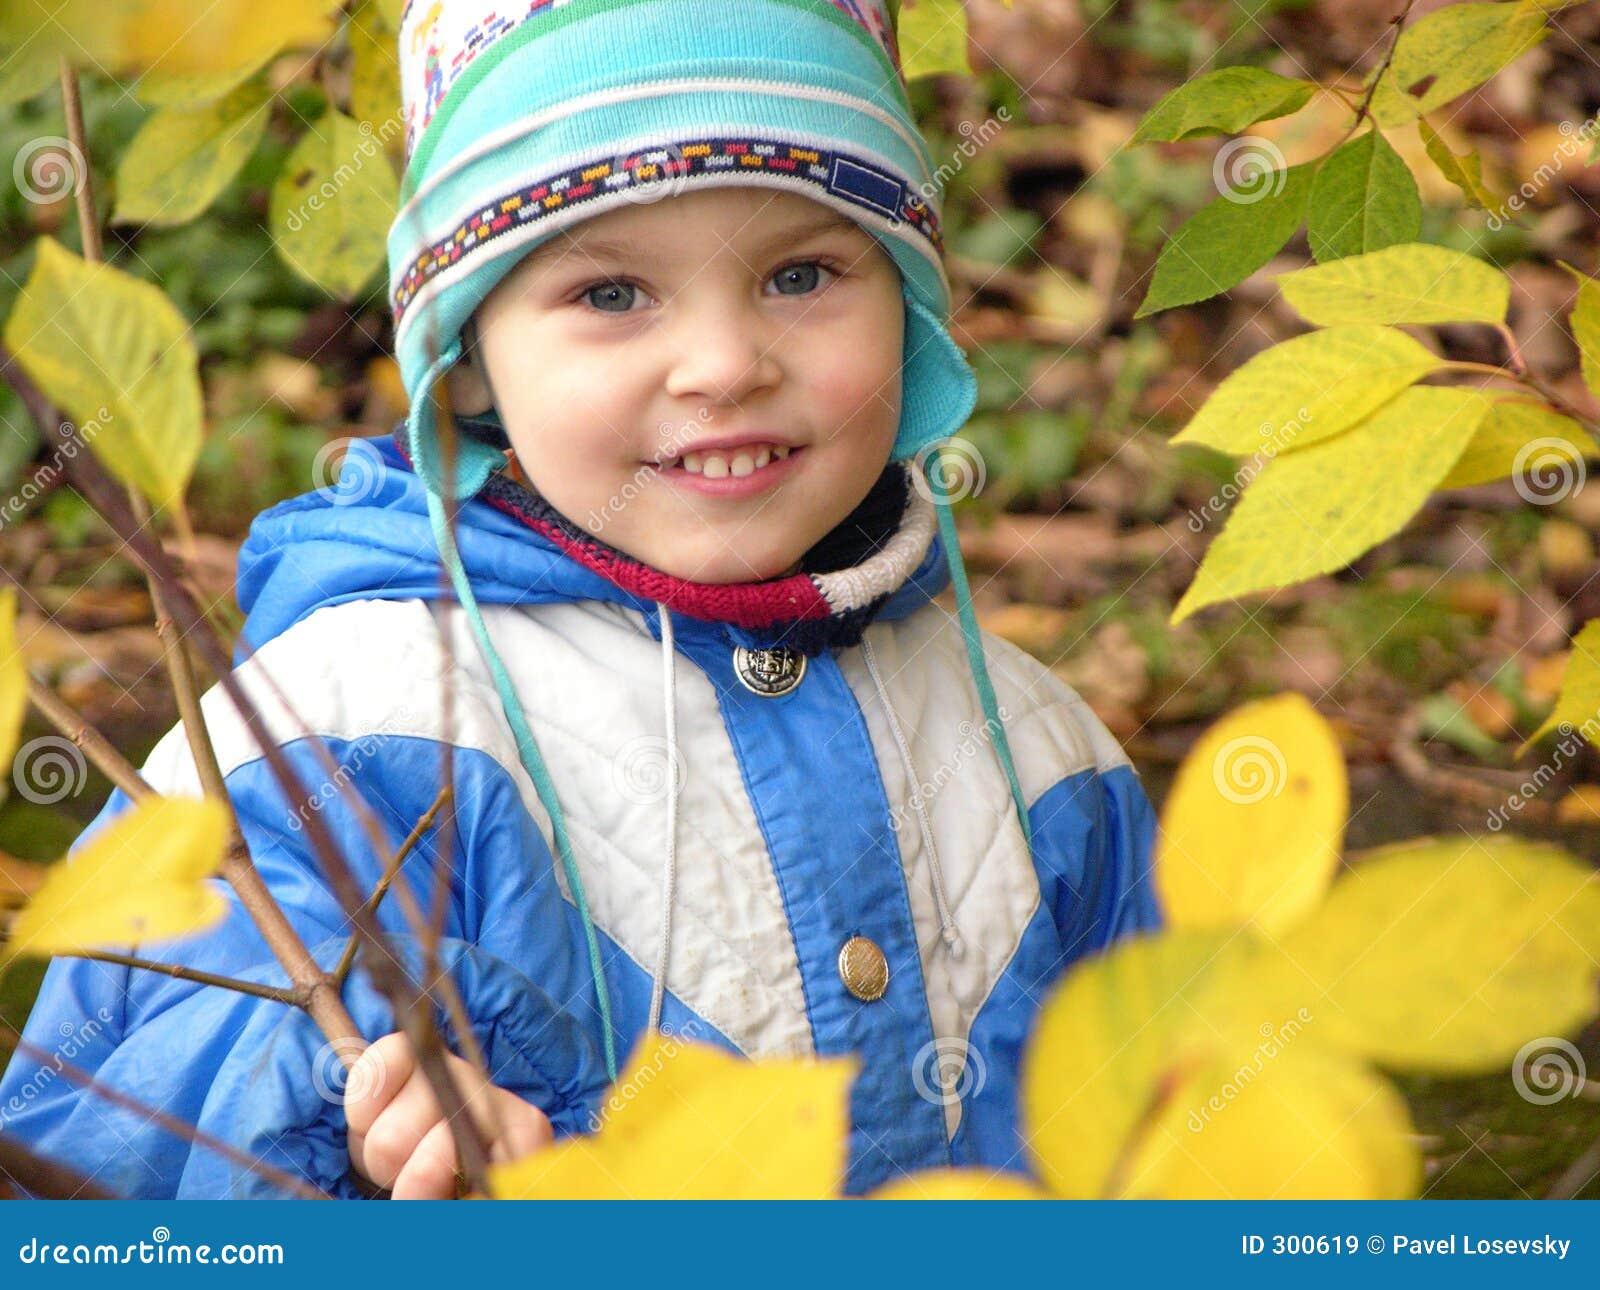 Child and autumn leaves around